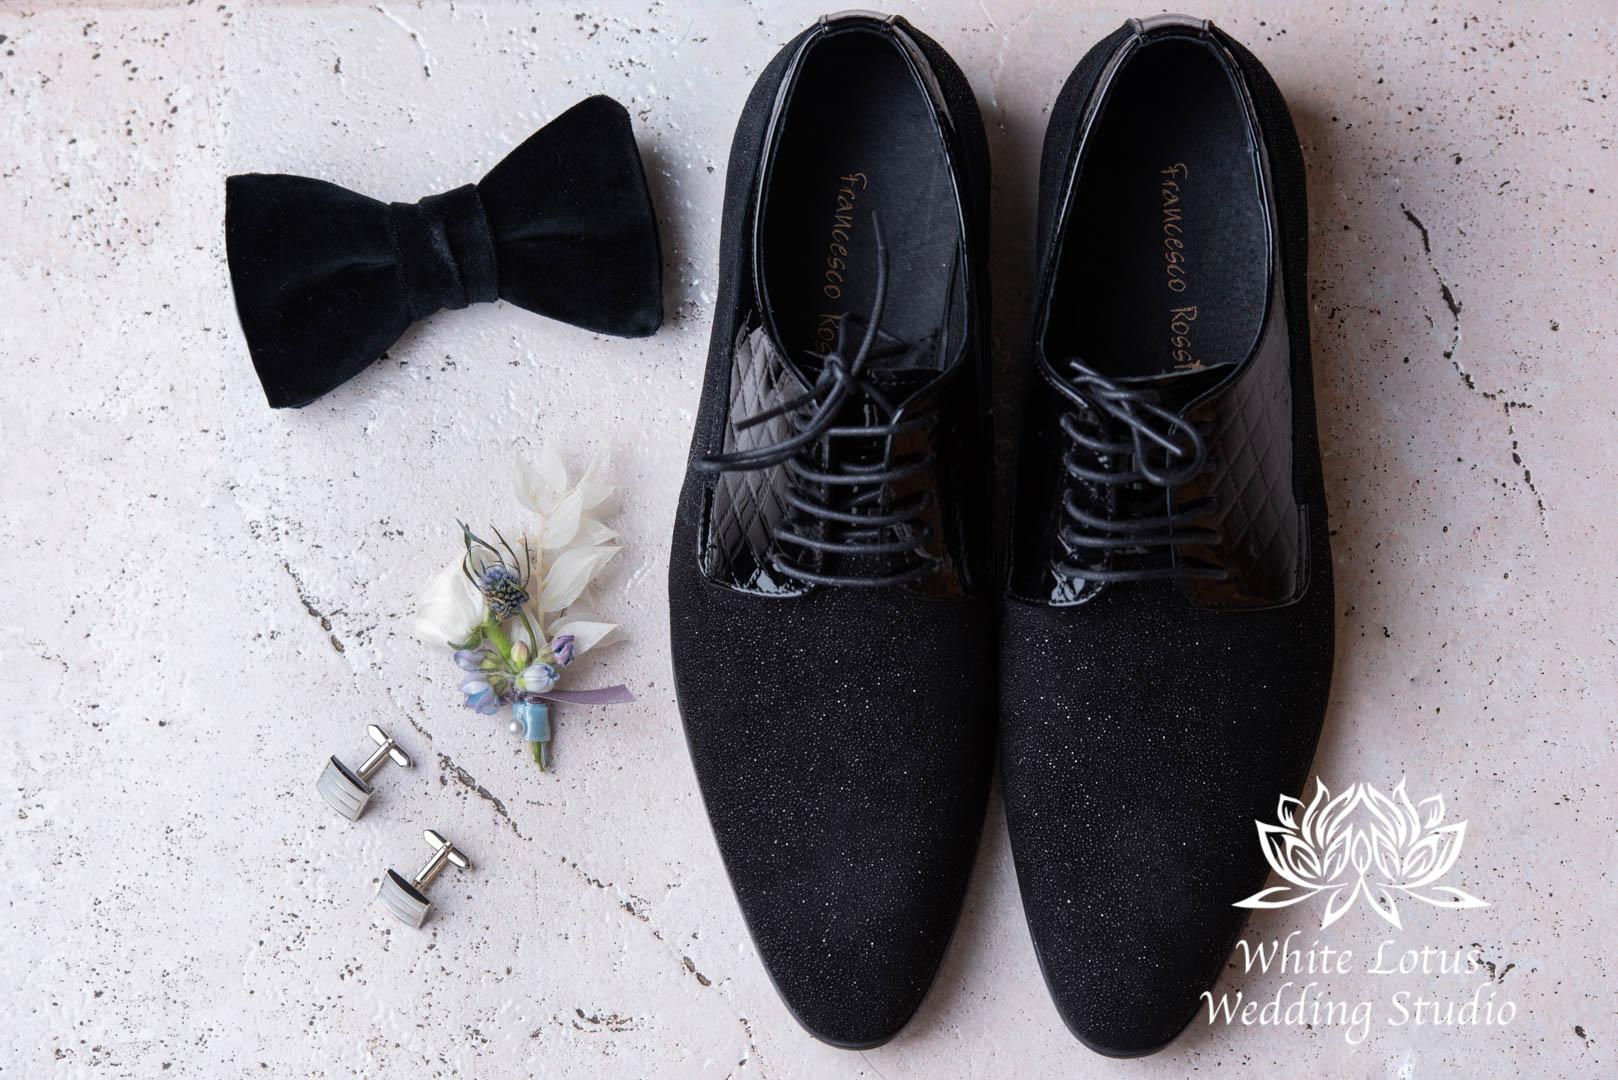 177- GLAM WINTERLUXE WEDDING INSPIRATION